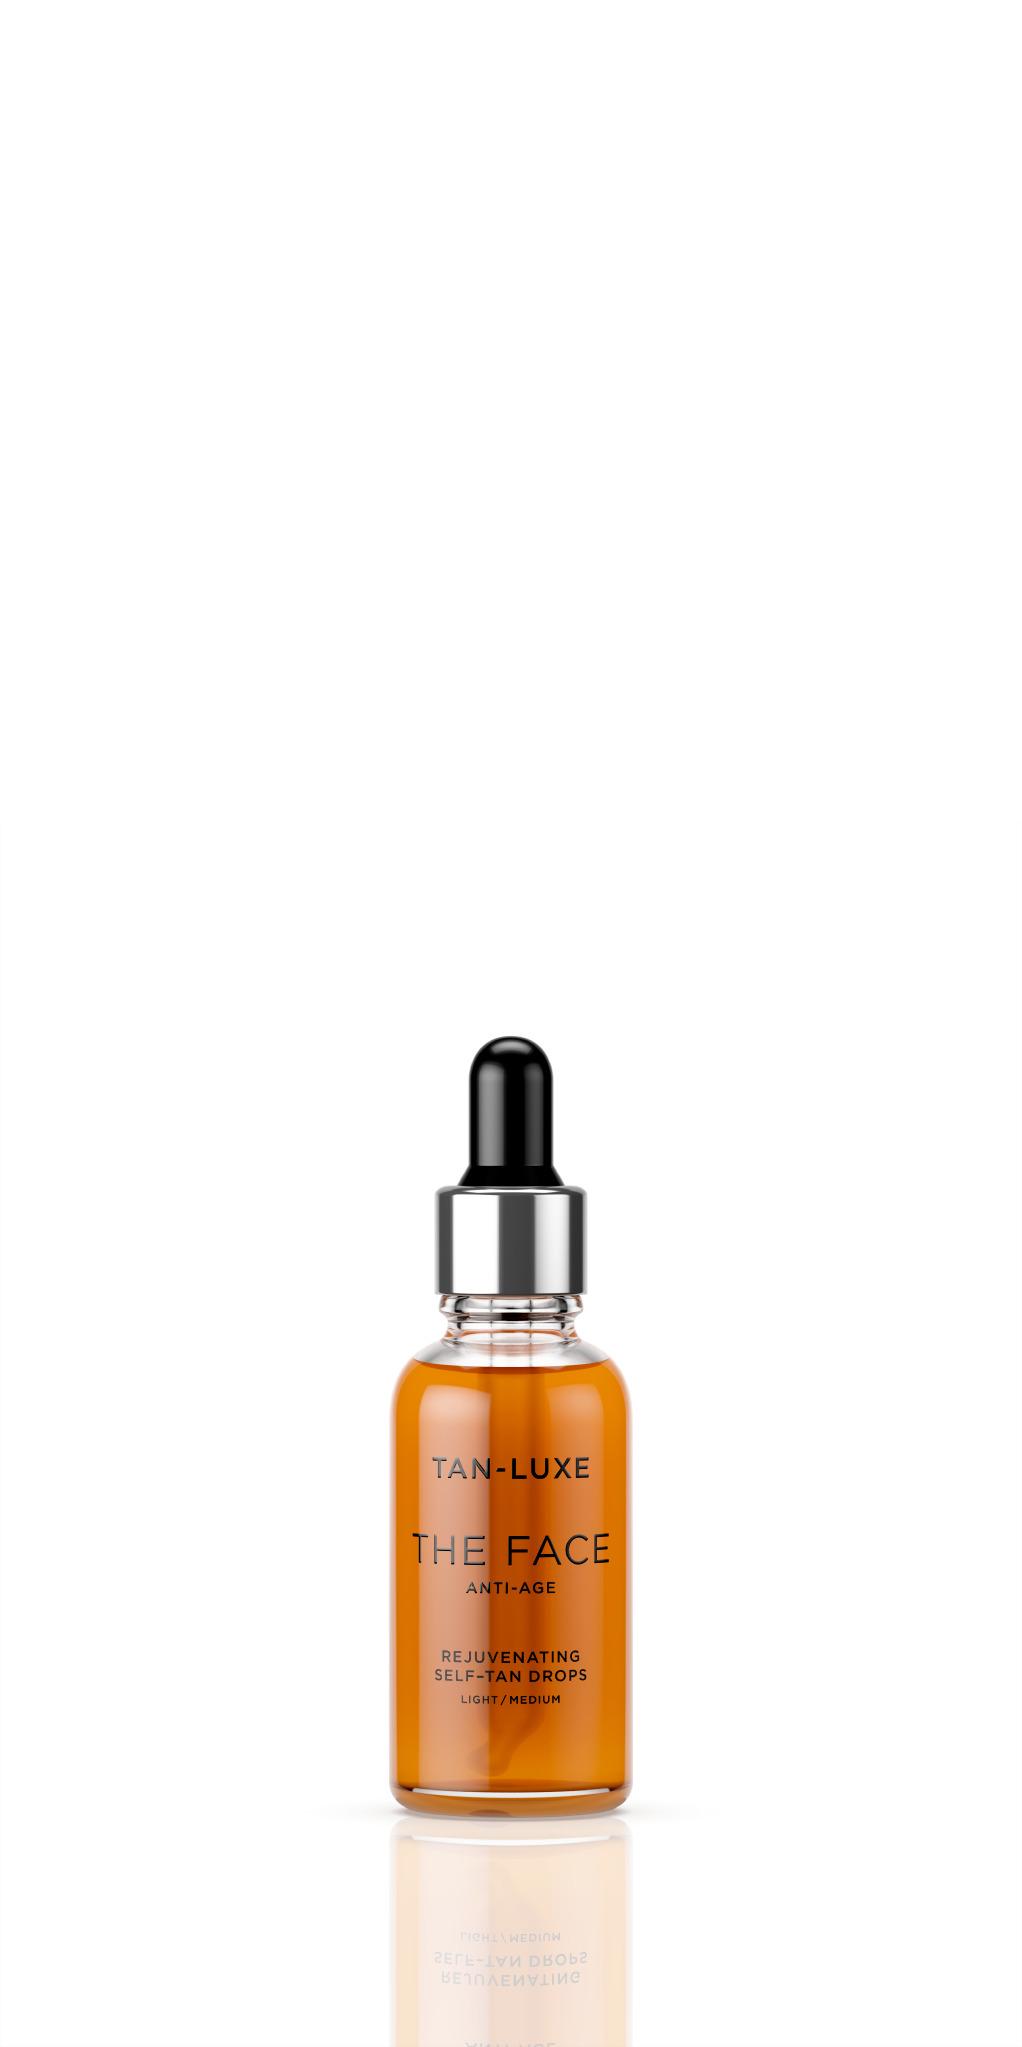 Tan Luxe The Face anti-age selvbruner dråber, 30 ml, light/medium